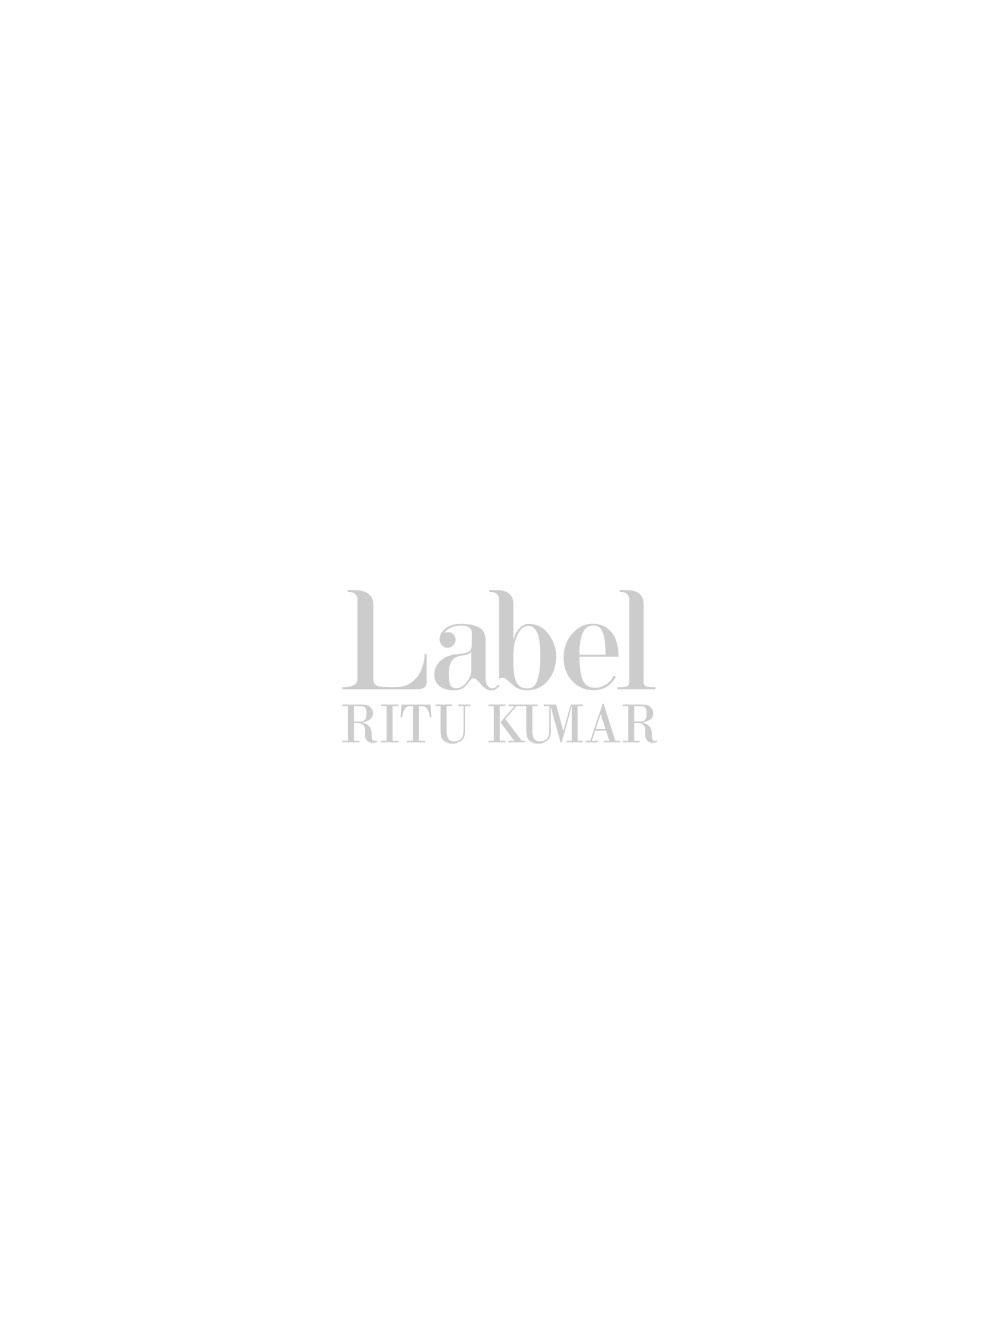 Yellow Flared Pleated Top   by label ritu kumar